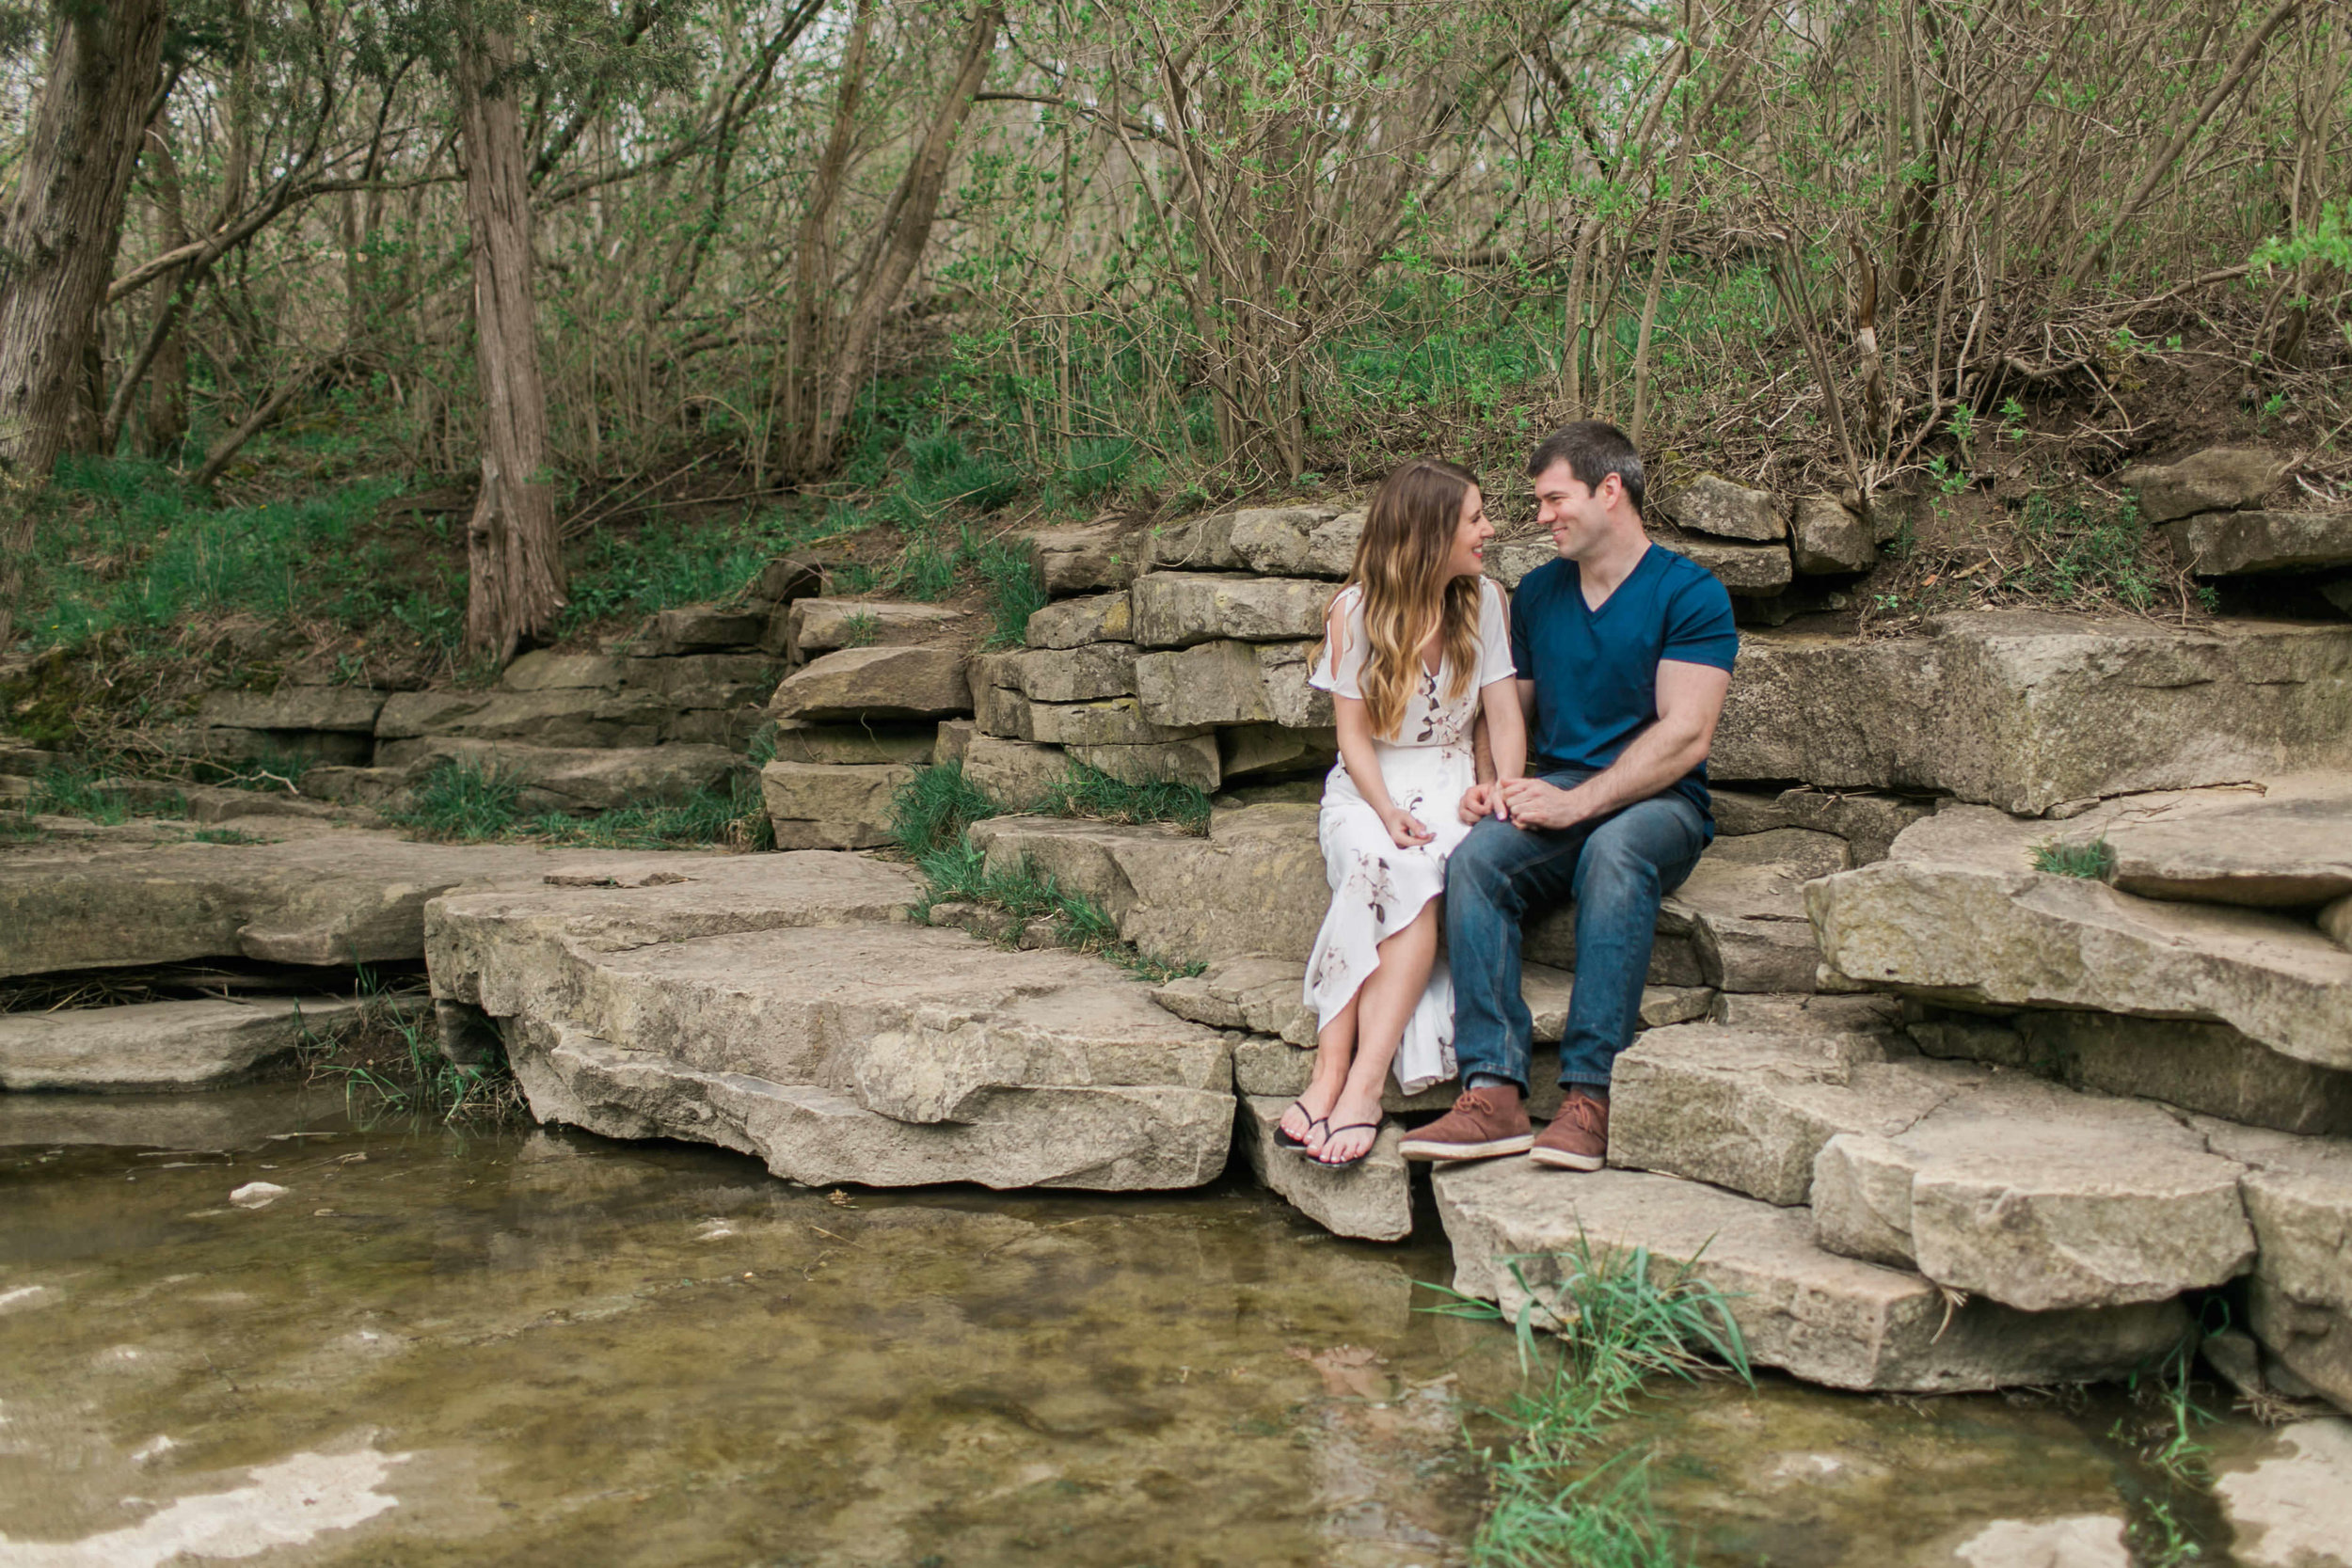 Holly___Ian___Engagement_Session___Daniel_Ricci_Wedding_Photography_39.jpg